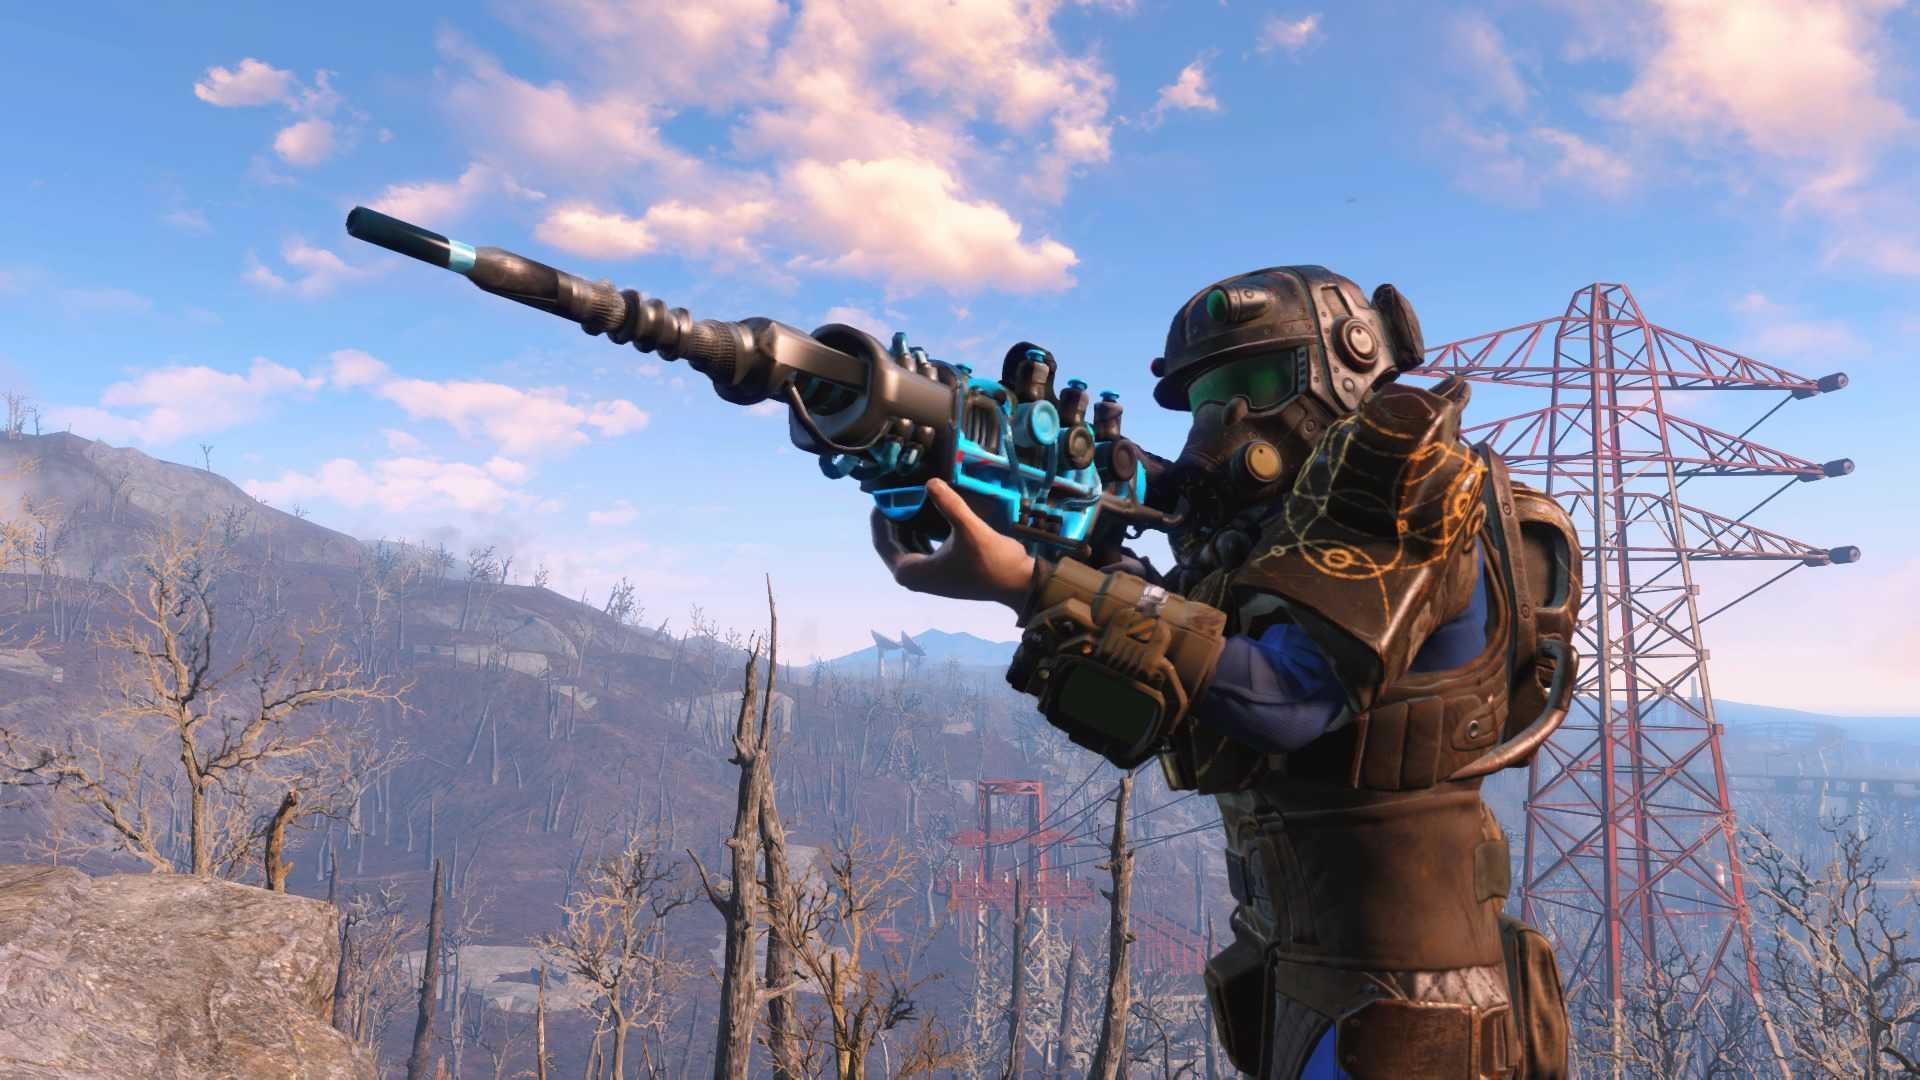 Fallout 4 - CP-35